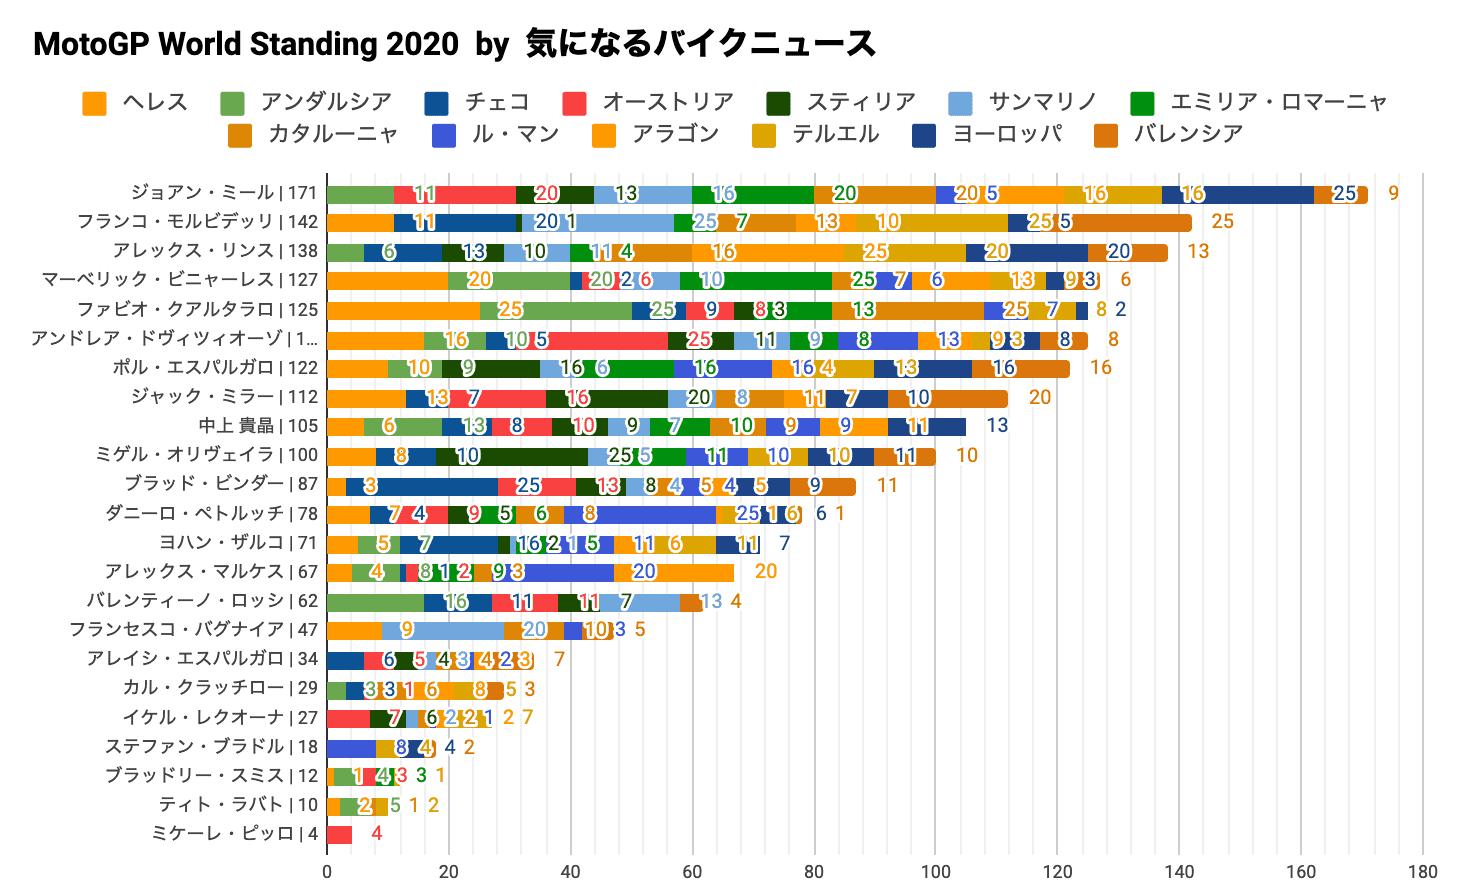 MotoGP2020チャンピオンシップ・スタンディング(2020/11/16時点)